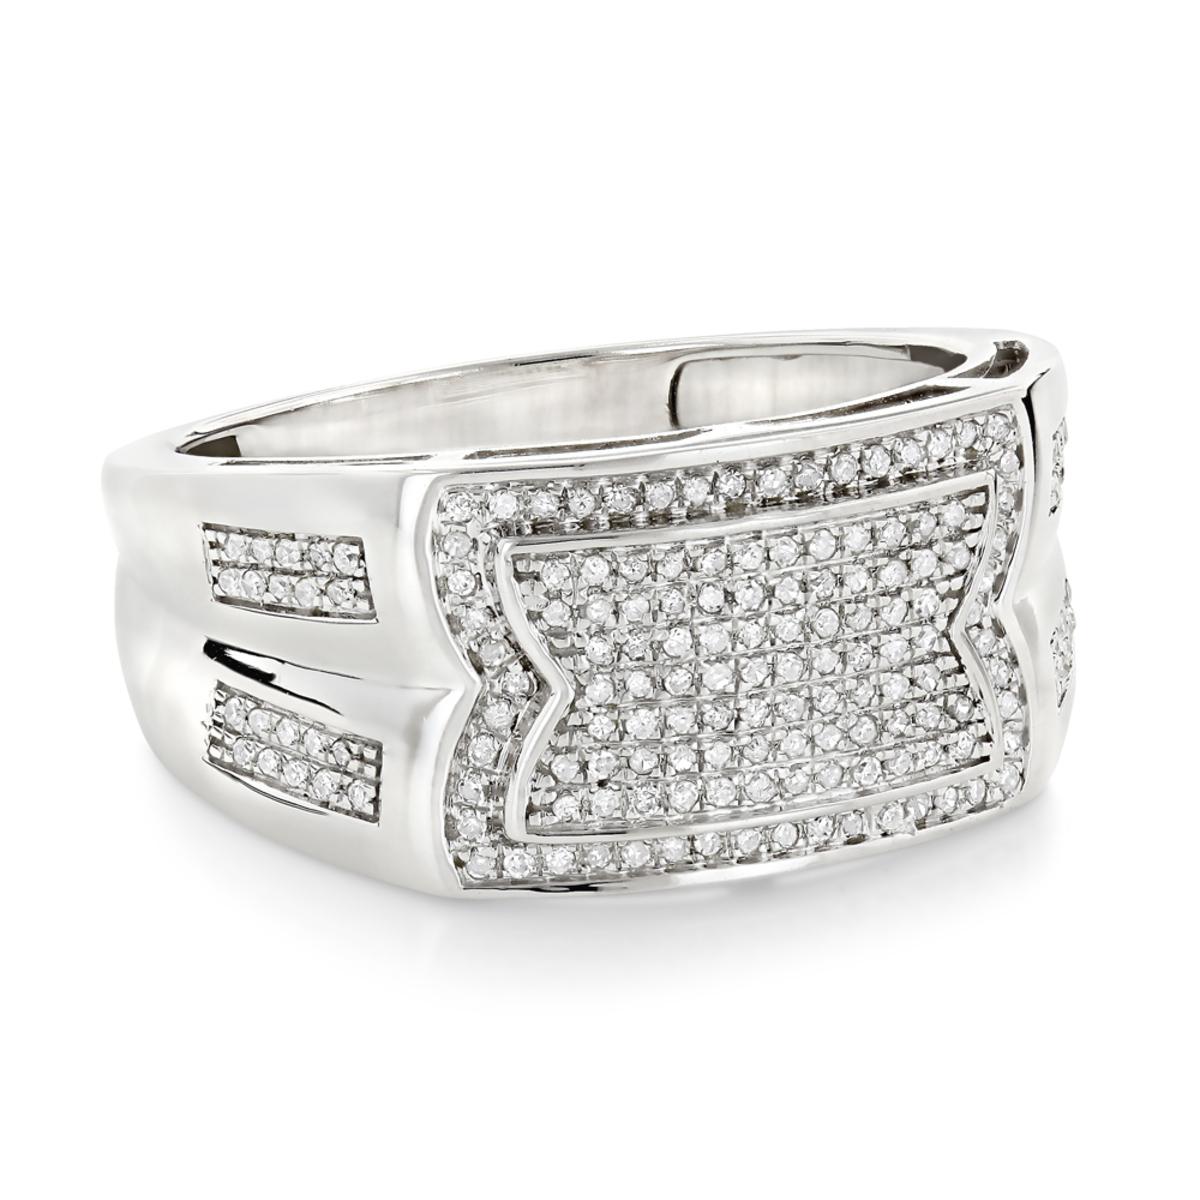 Mens Pave Diamond Ring 10K Gold Wedding Band 0.45ct